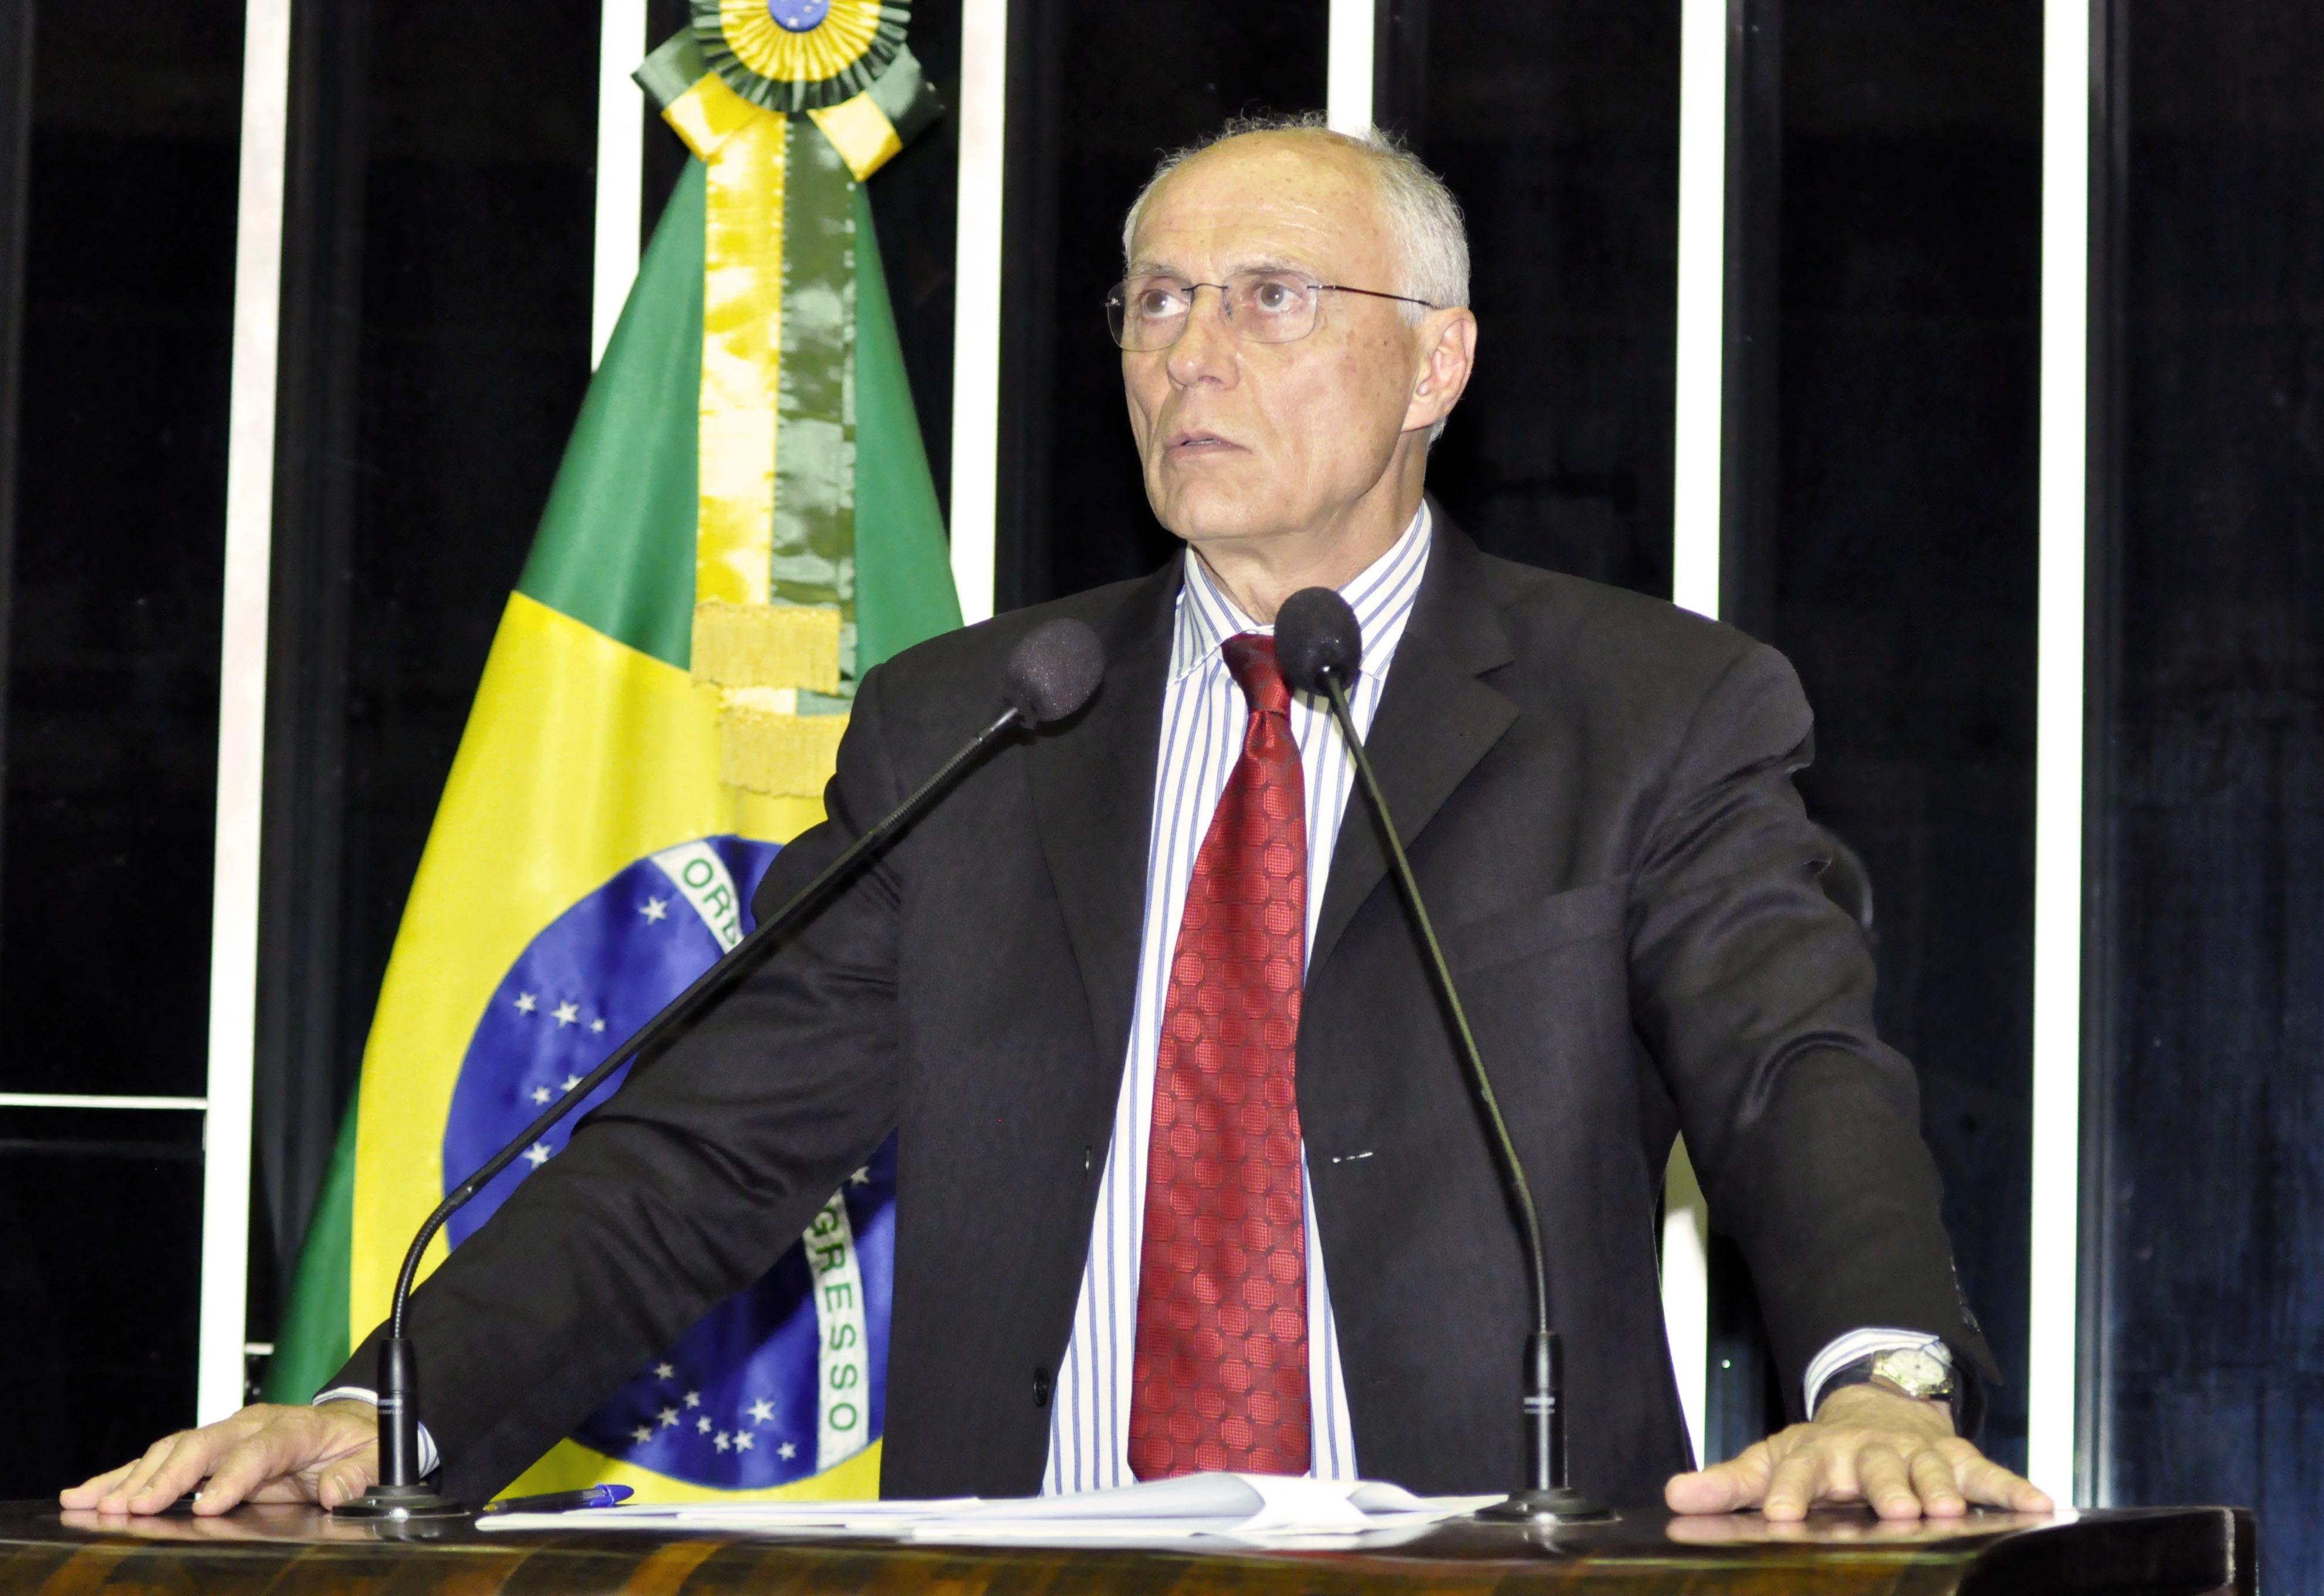 Senador Eduardo Suplicy Instituto Baresi #B7AE14 3960 2720